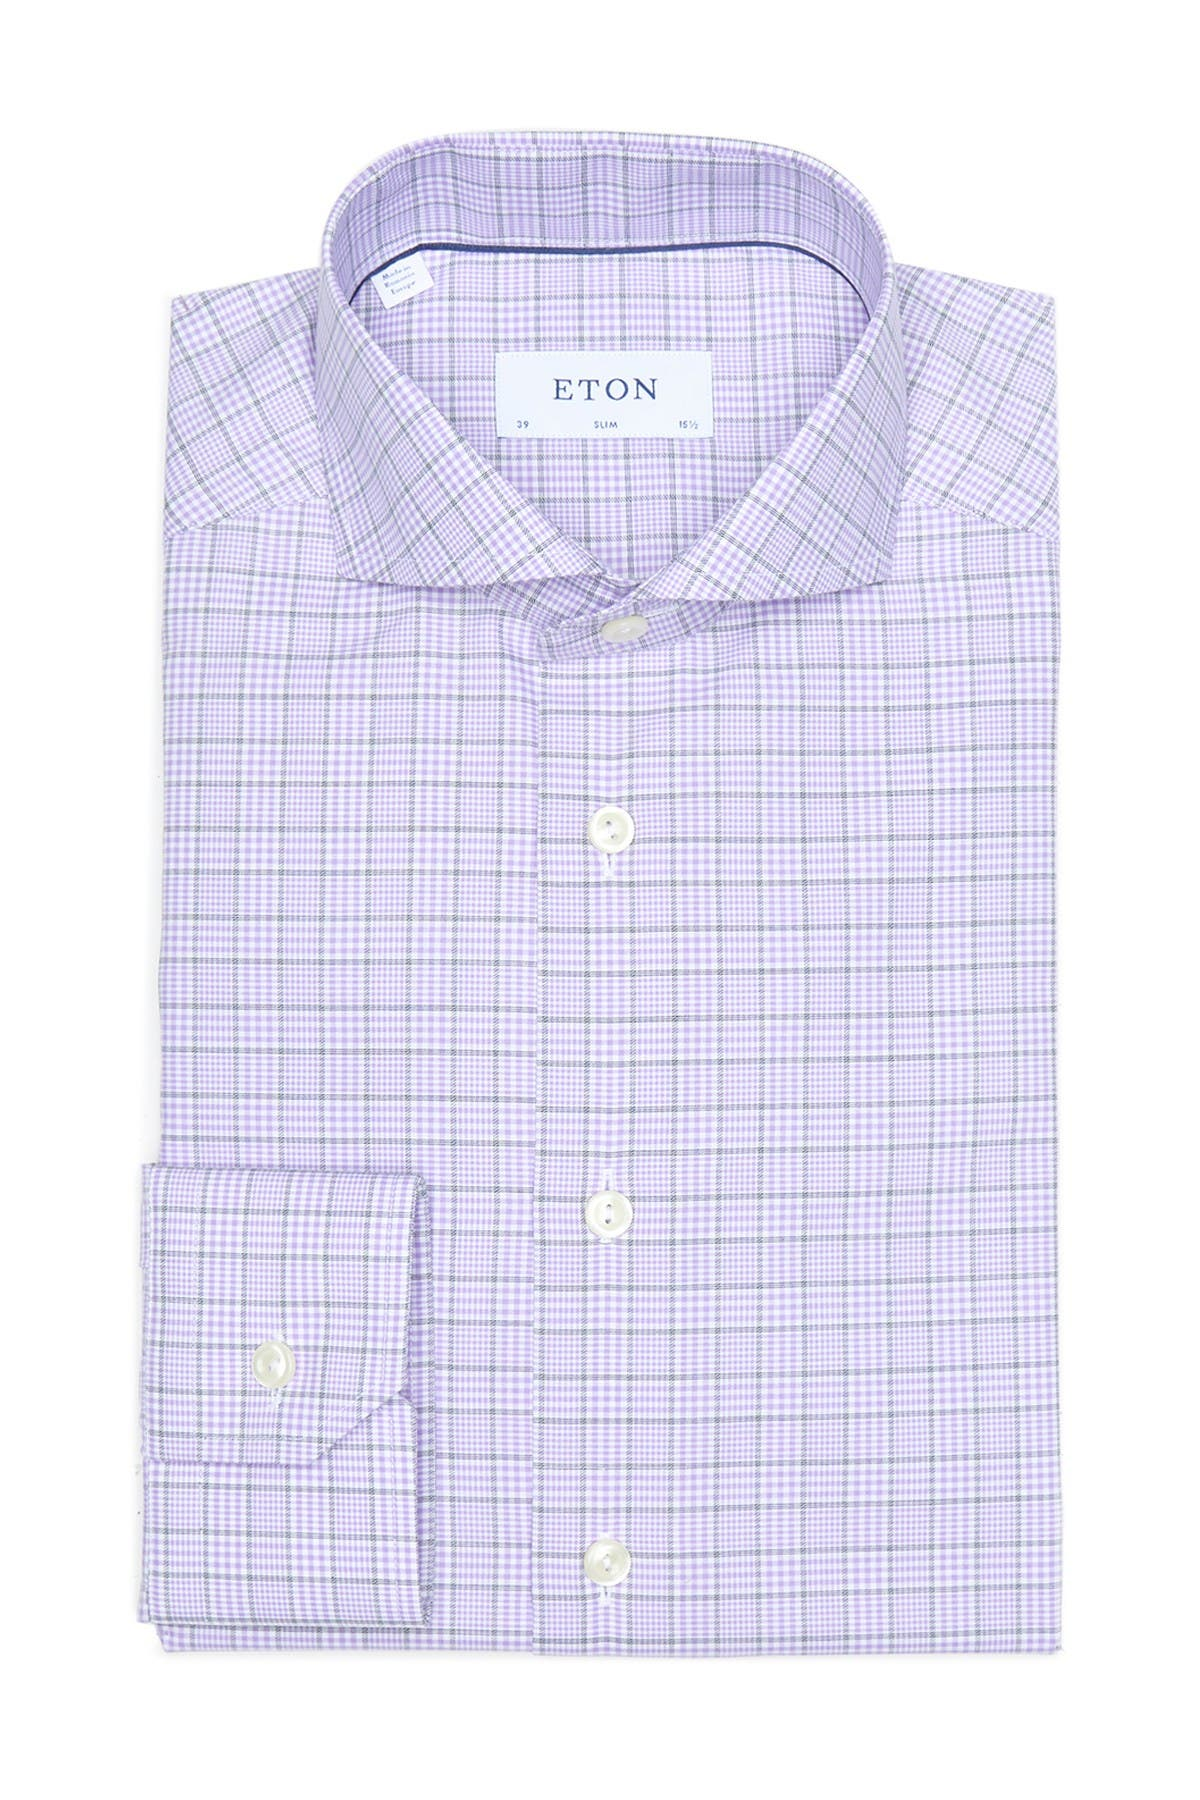 Image of Eton Slim Fit Check Dress Shirt